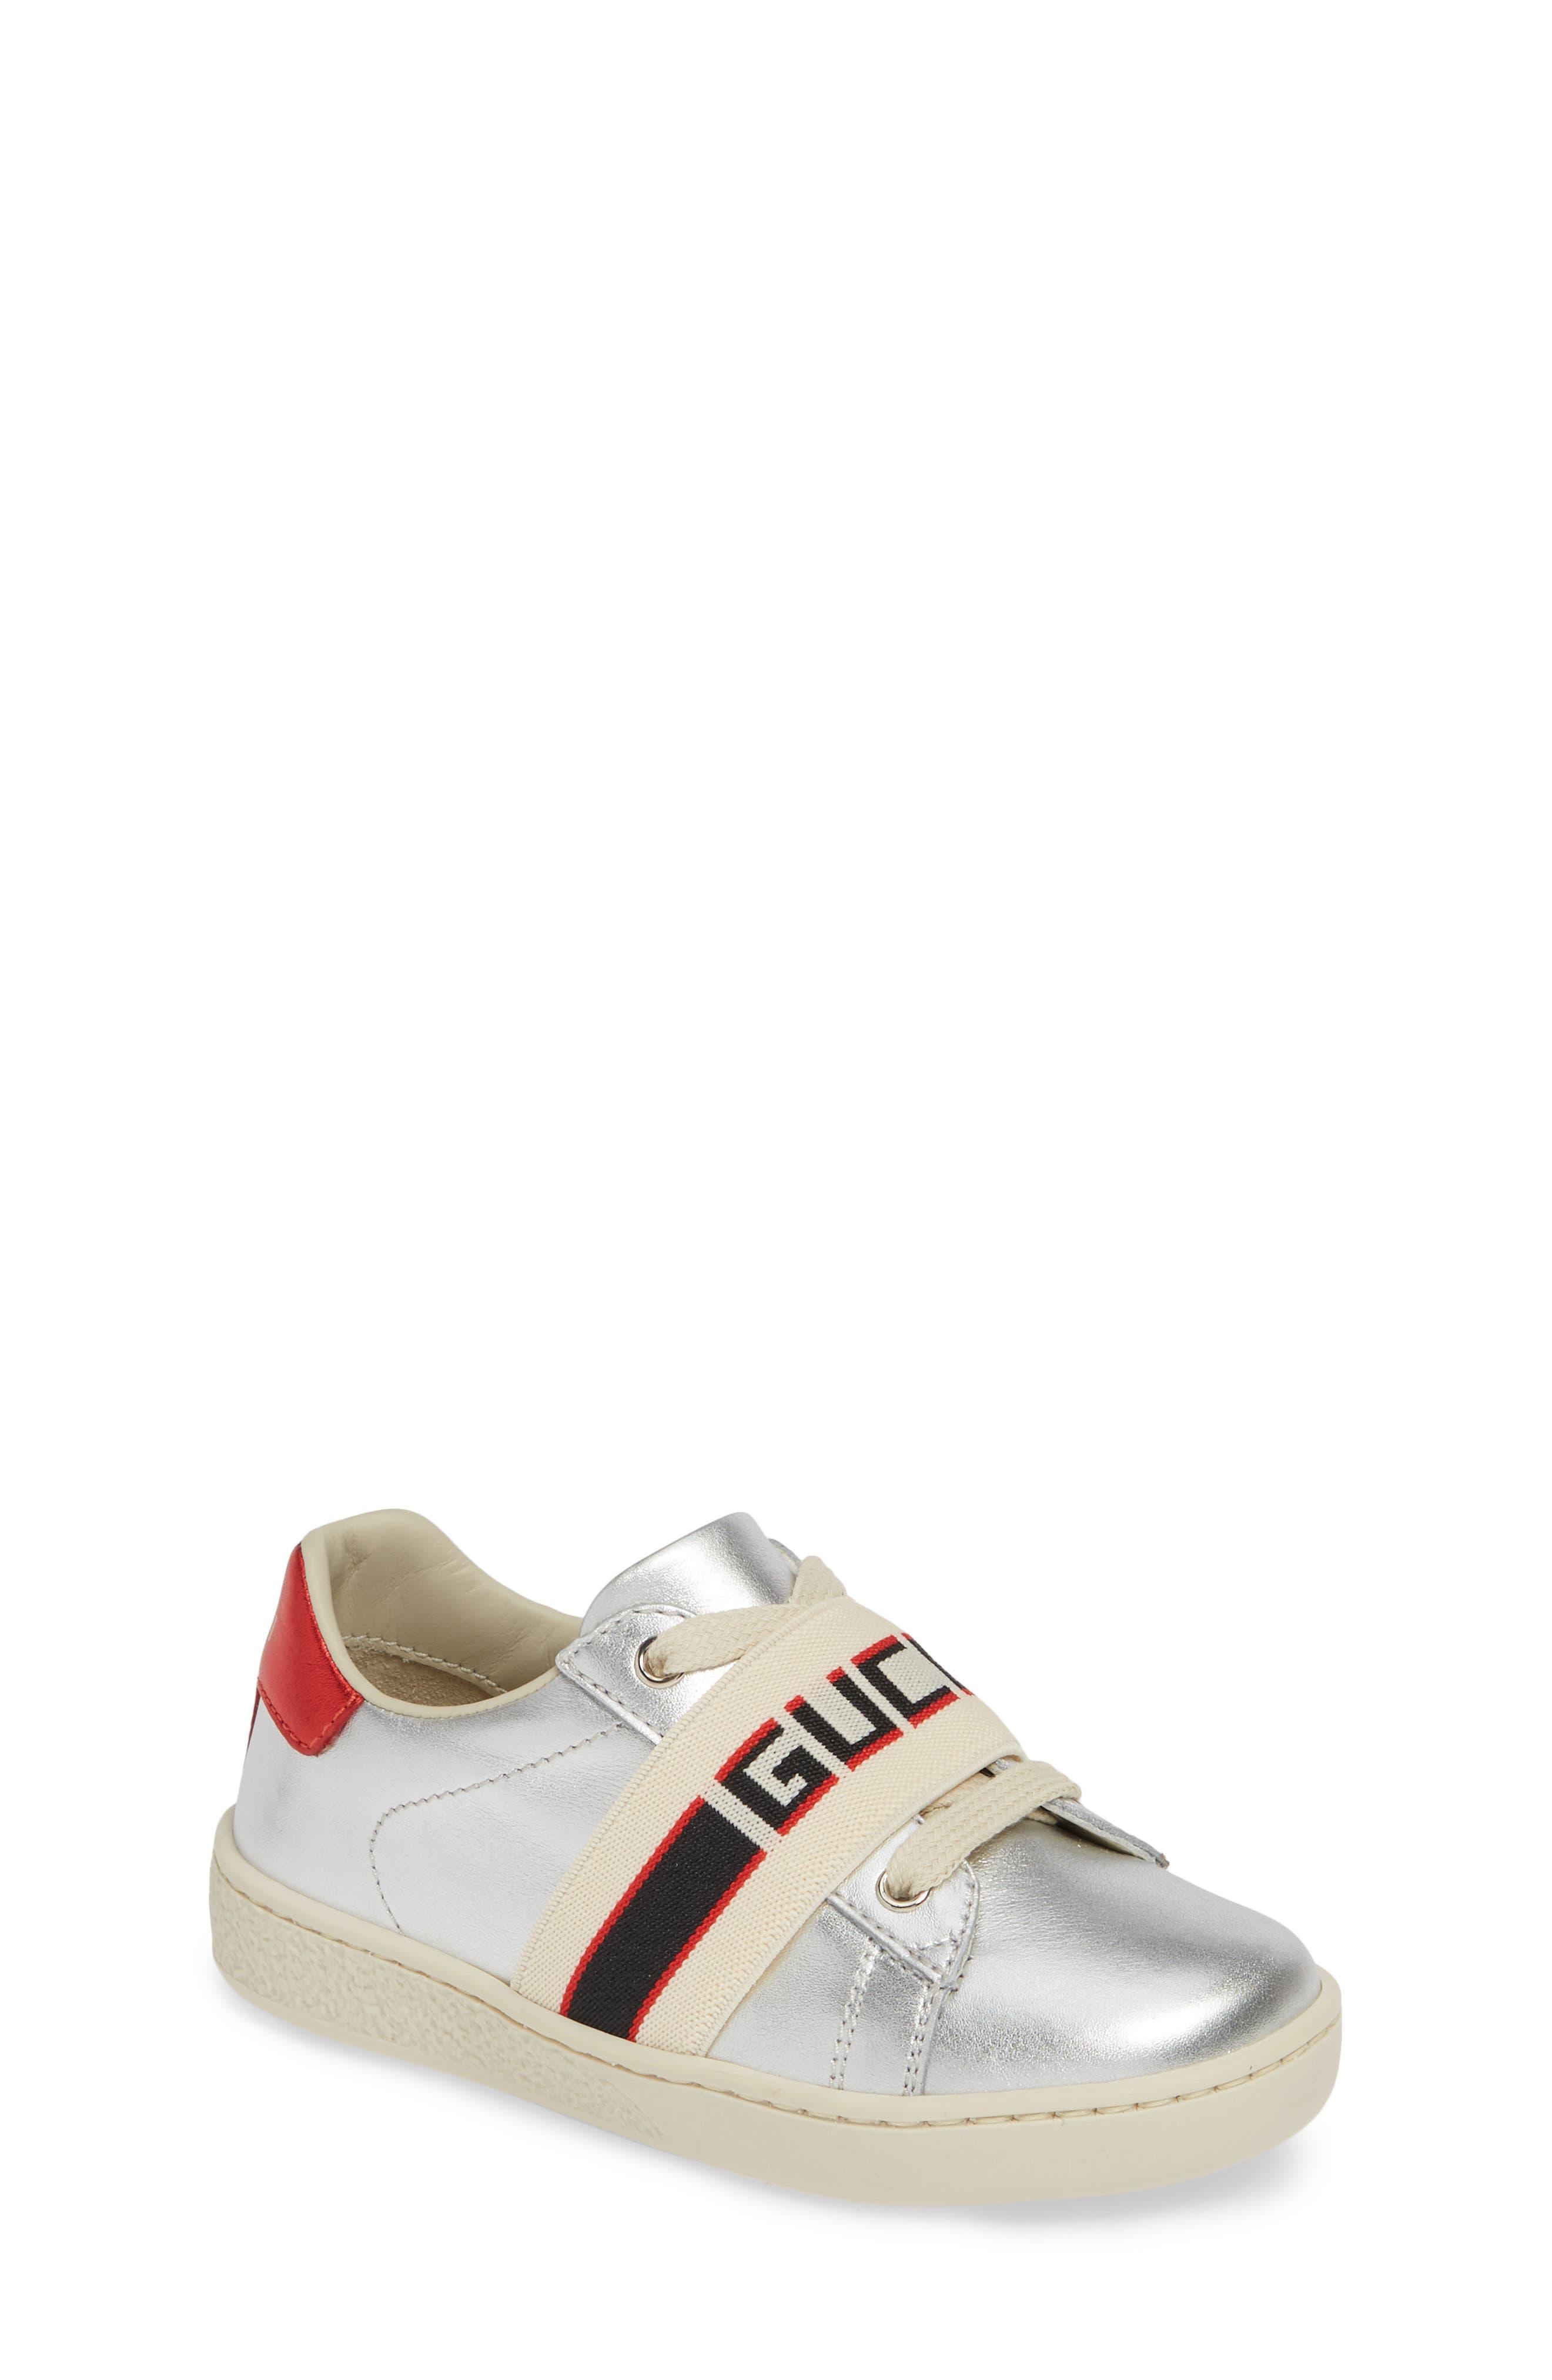 GUCCI, New Ace Stripe Sneaker, Main thumbnail 1, color, SILVER